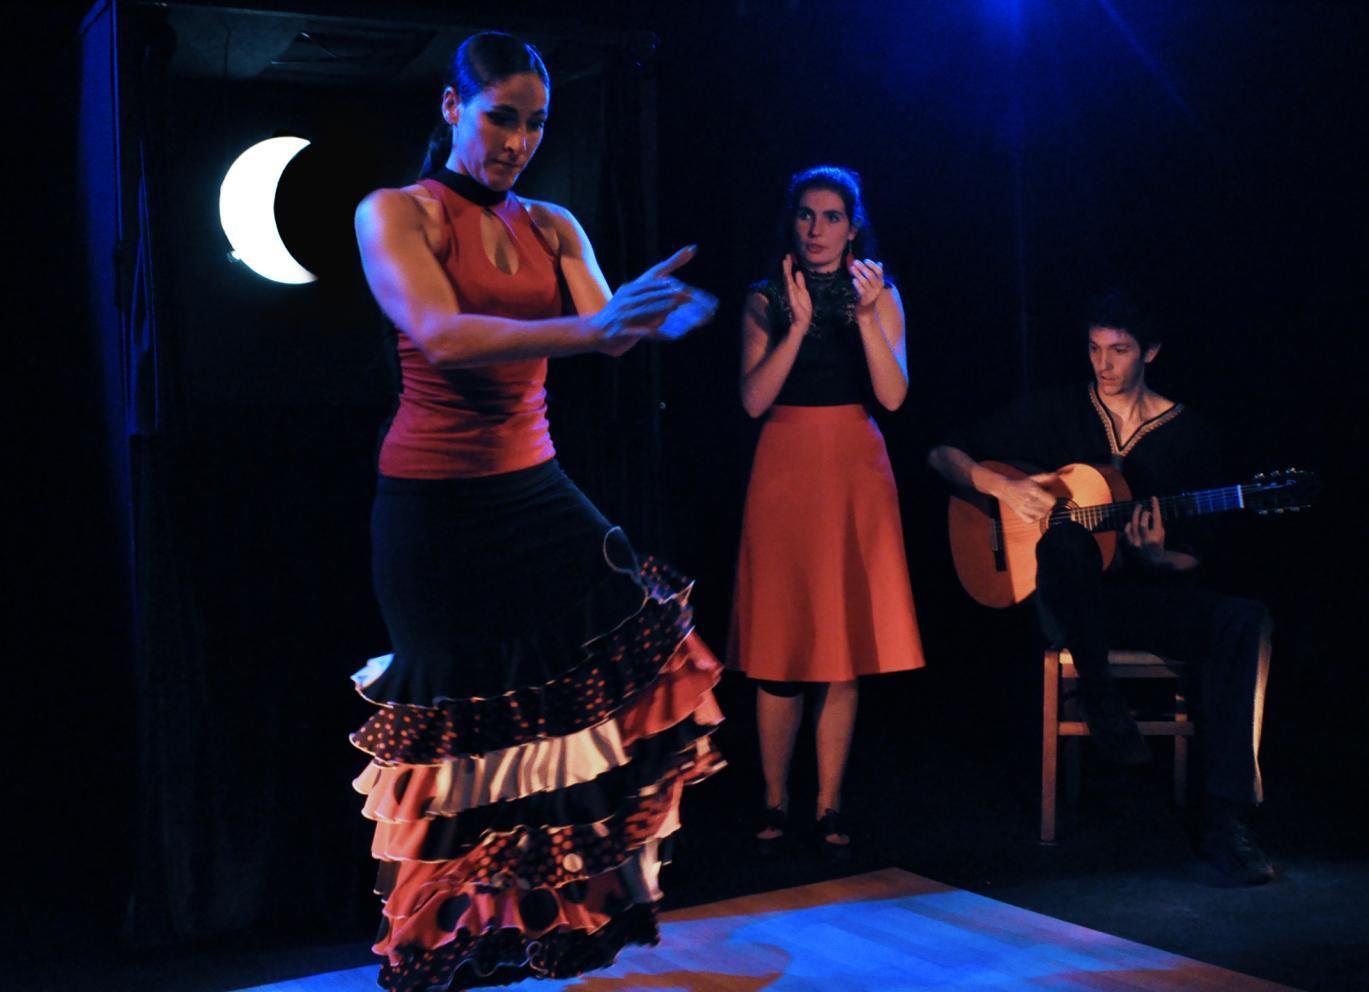 la compagnie de théâtre de flamenco anda jaleo